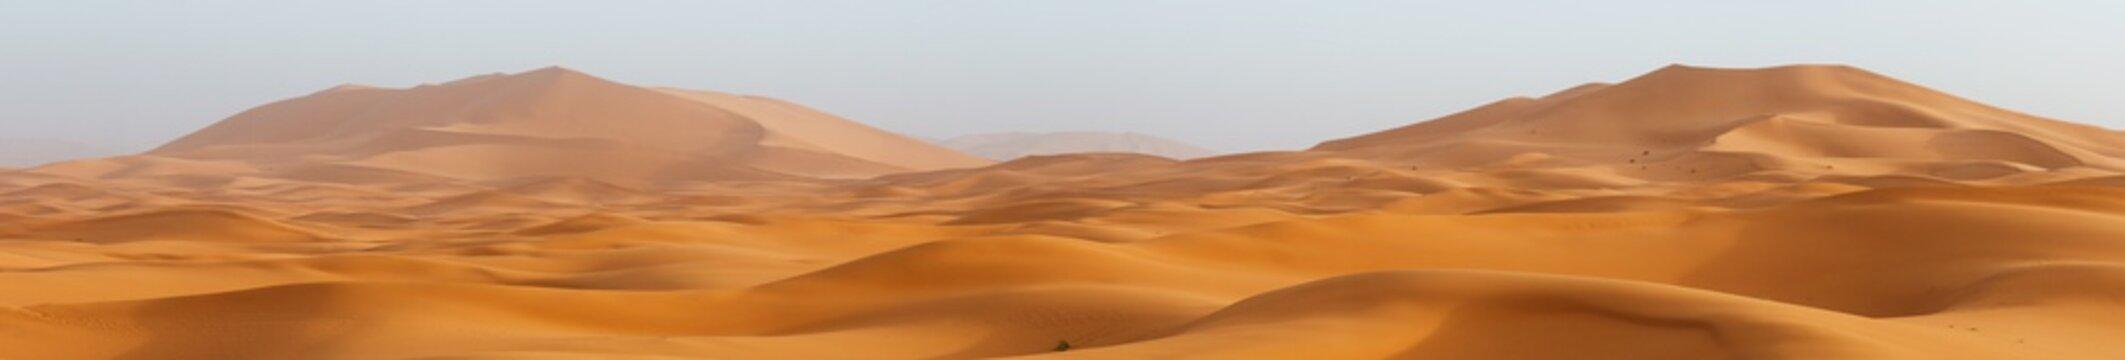 Amazing panorama landscape showing Erg Chebbi sanddunes desert at the Western Sahara Desert of Morocco